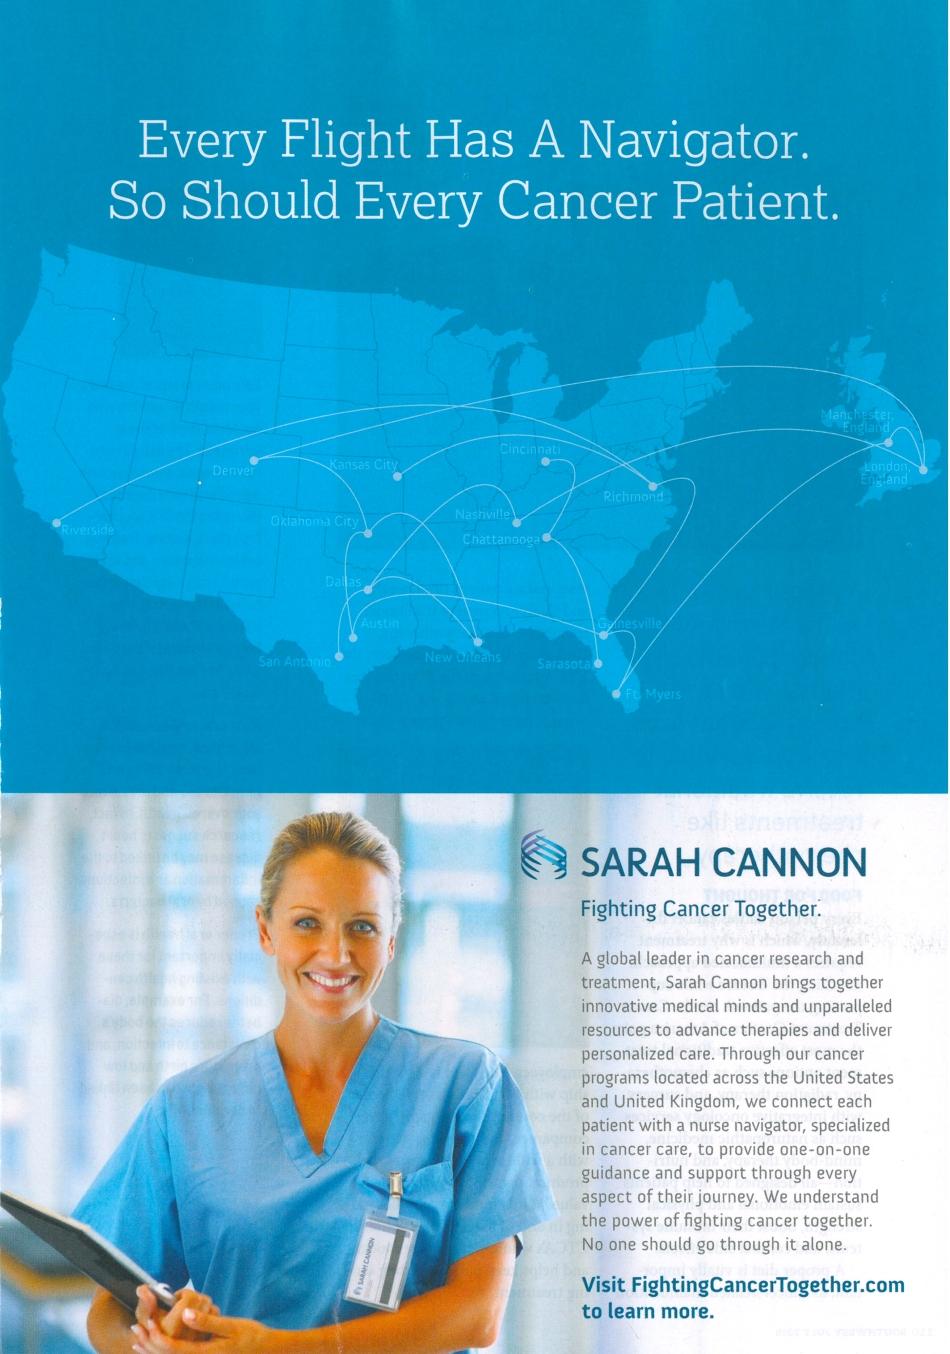 Sarah Cannon